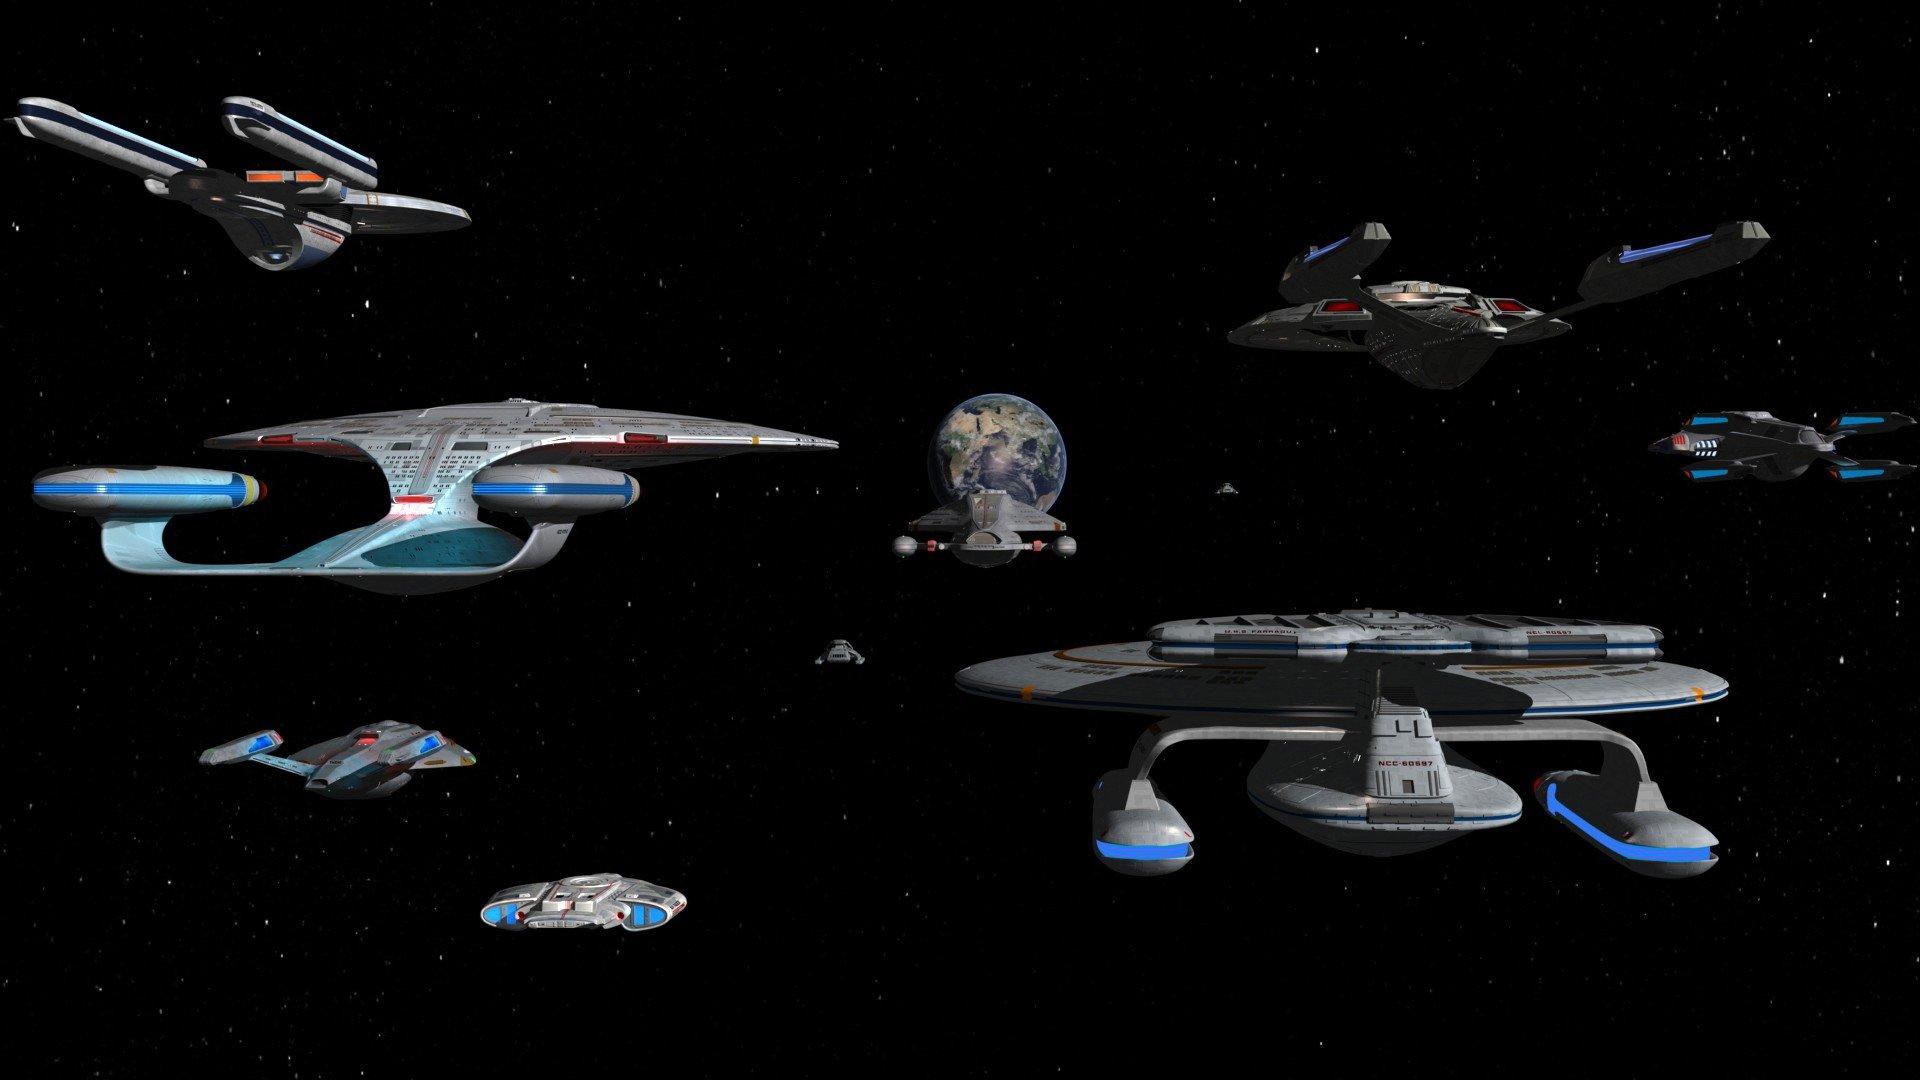 wallpaper : 1920x1080 px, spaceship, star trek 1920x1080